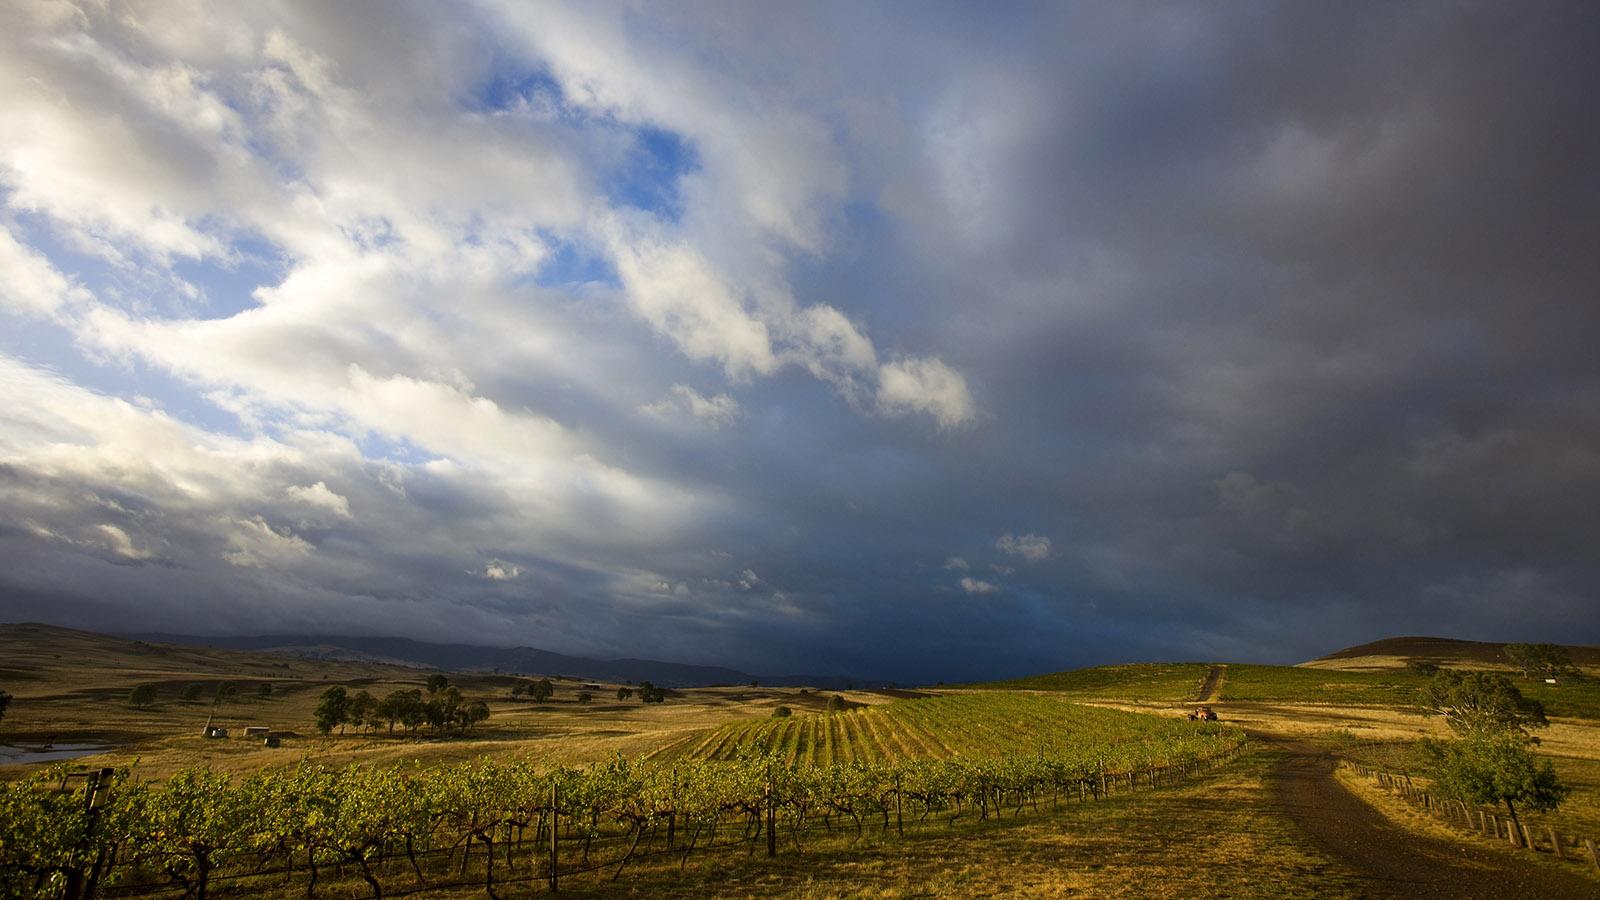 Delatite Winery, High Country, Victoria, Australia